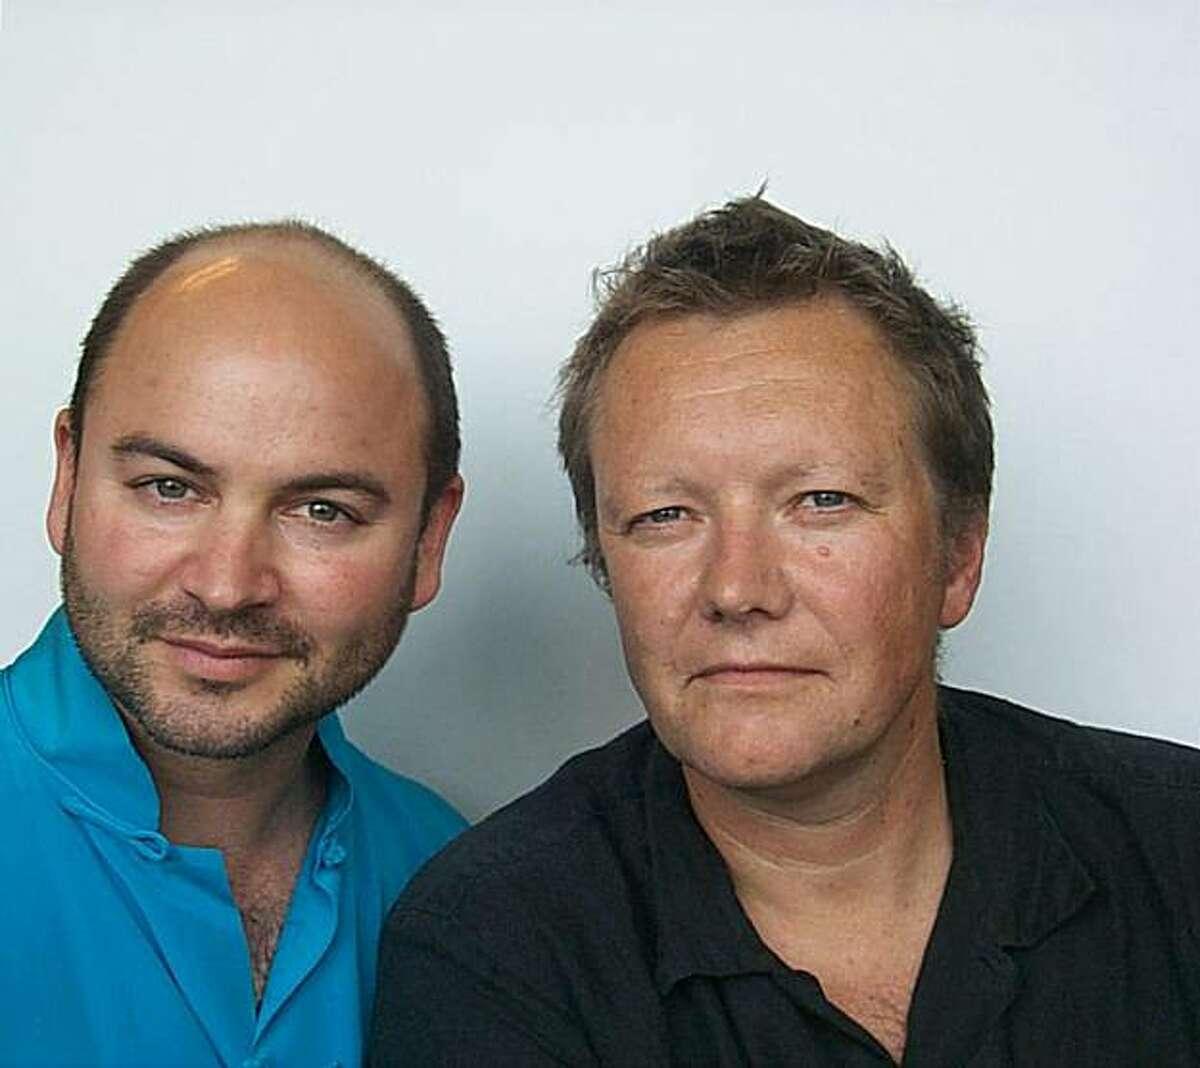 Craig Dykers and Kjetil Thorsen of Snohetta.